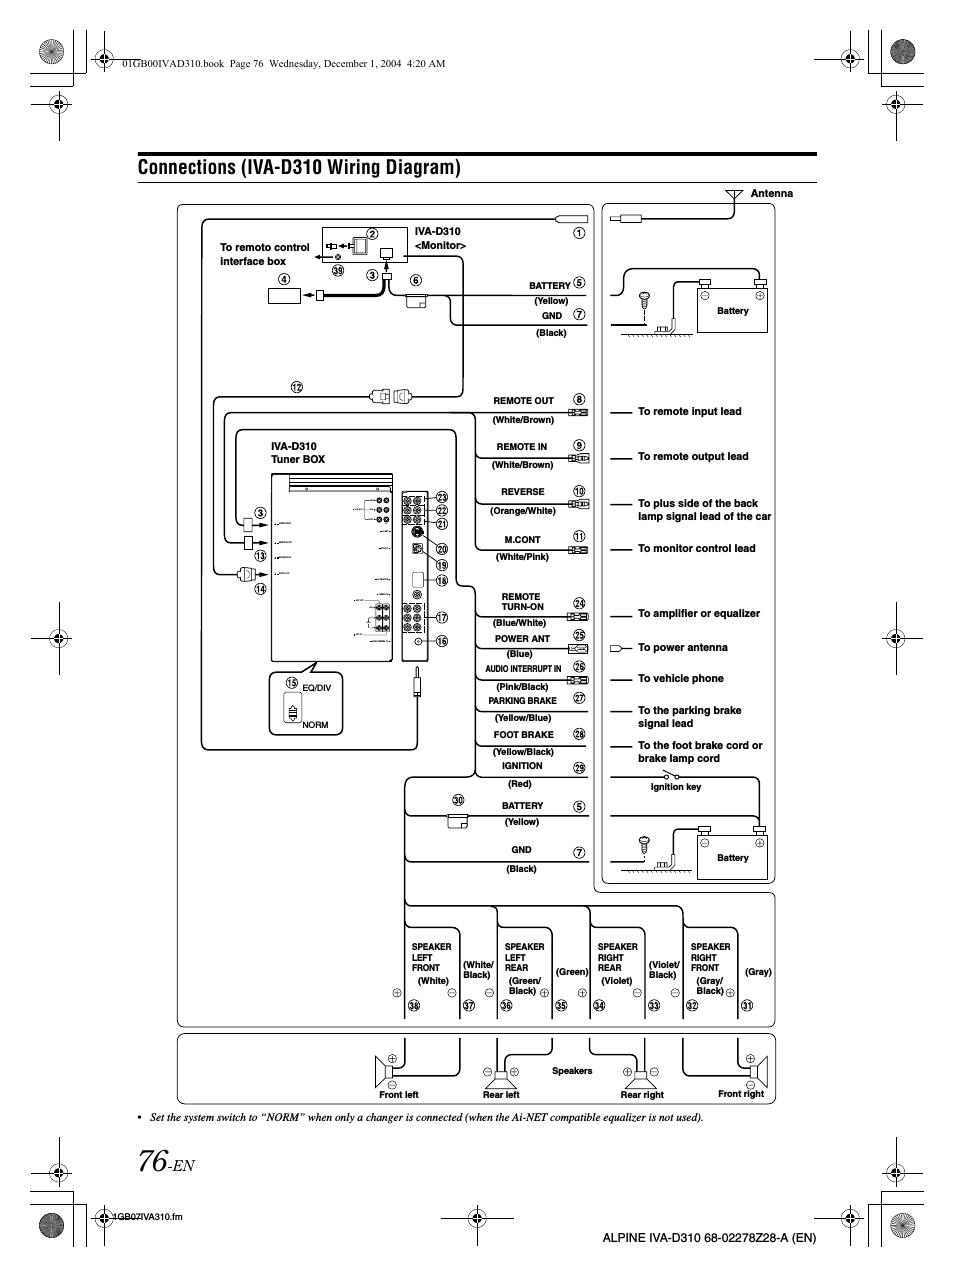 [DVZP_7254]   YB_8335] Alpine Cde 121 Wiring Diagram Free Diagram | Alpine Cde 121 Wire Diagram |  | Barep Over Boapu Mohammedshrine Librar Wiring 101